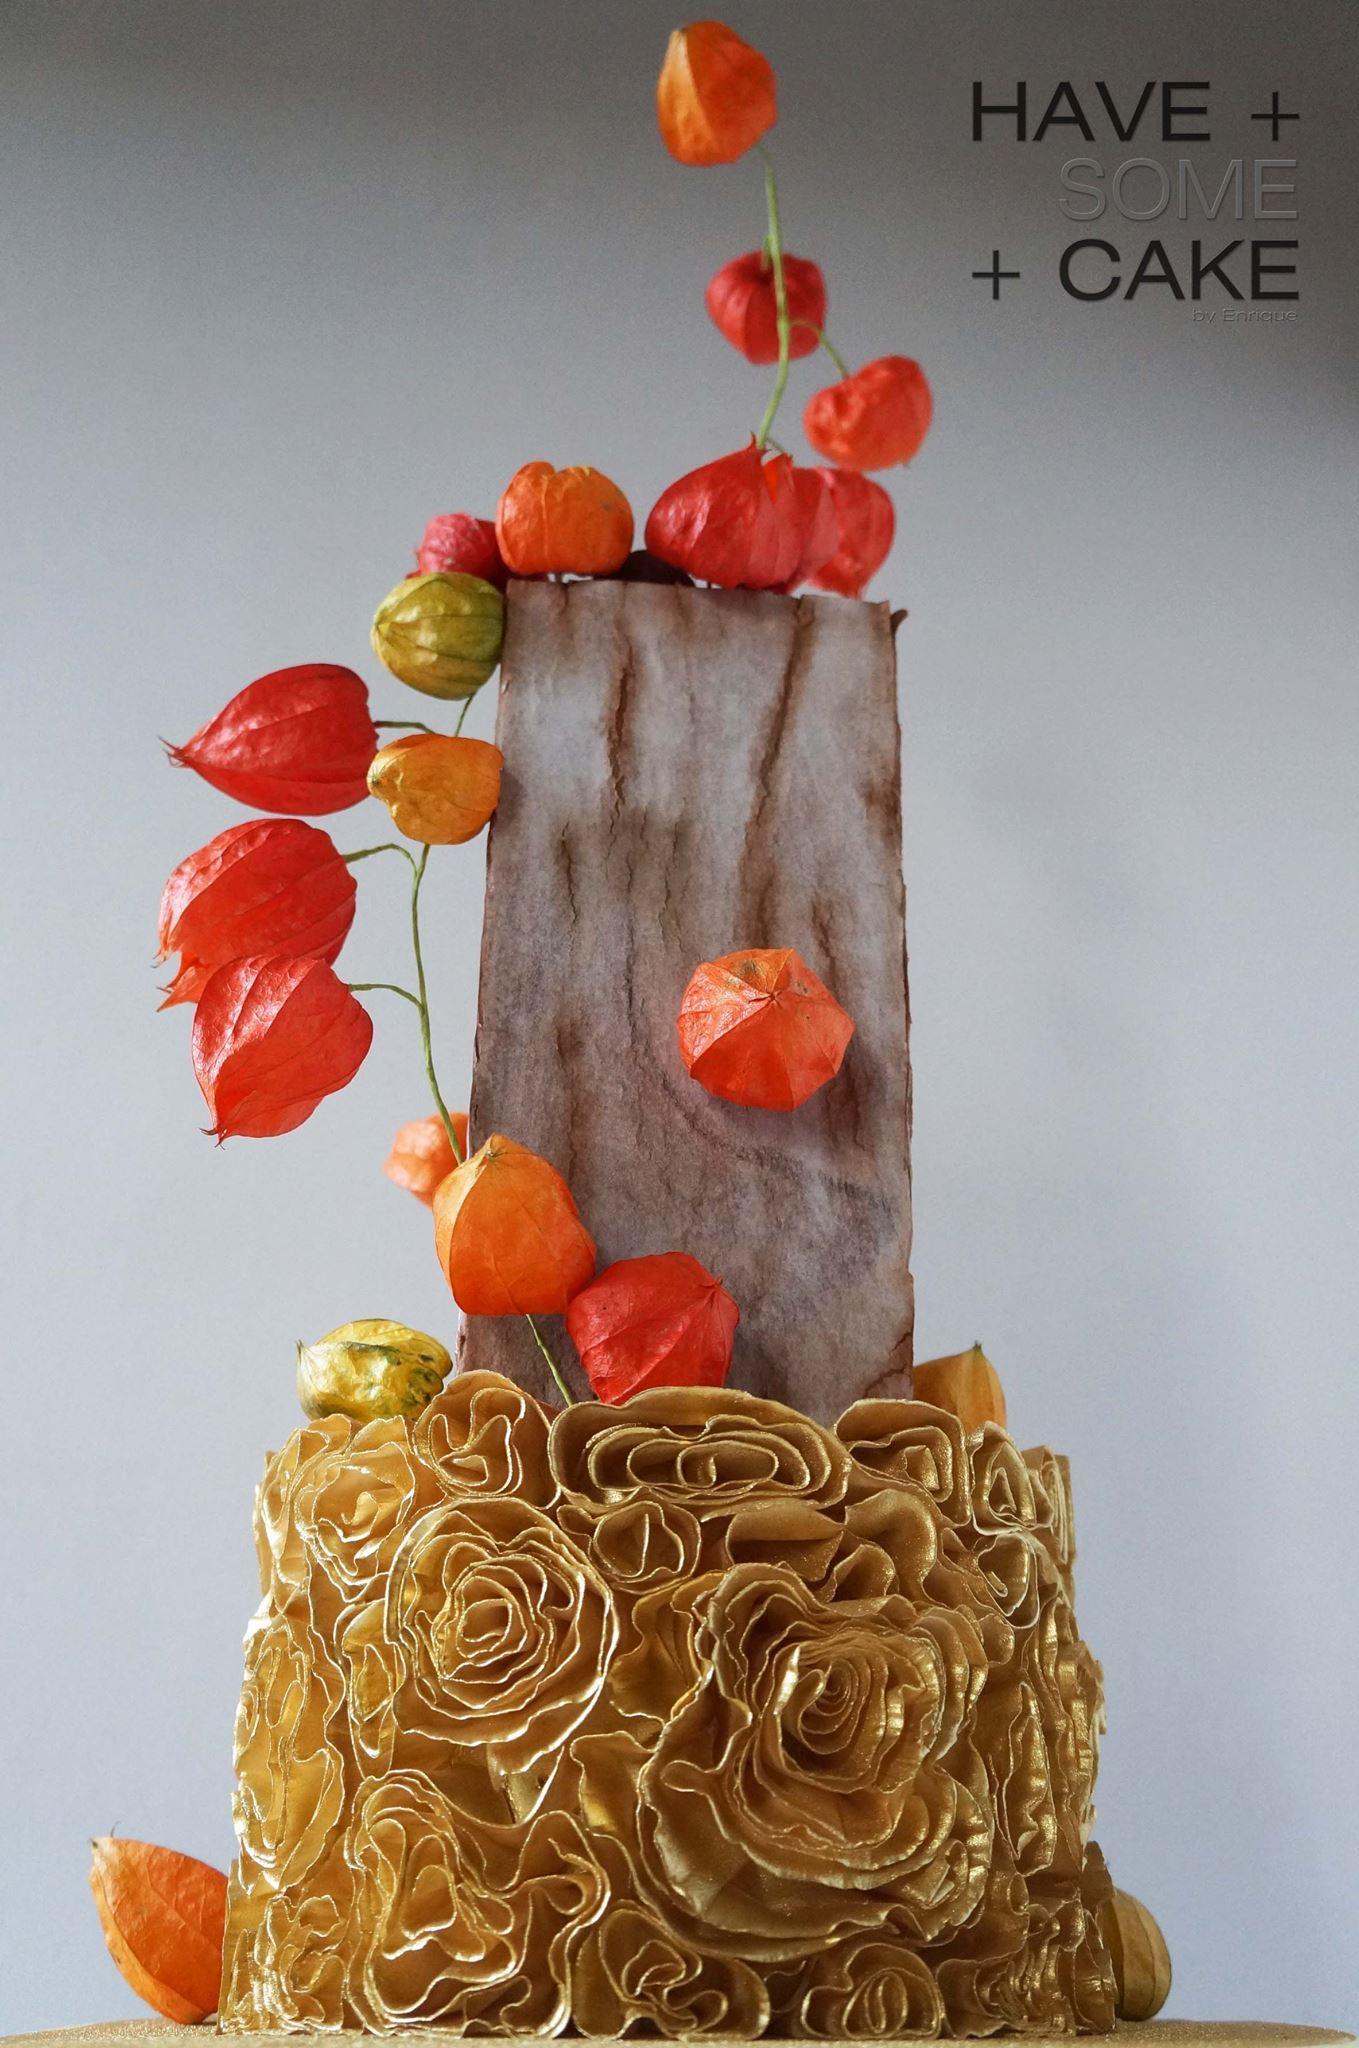 Enrique-Roja-HAVE-SOME-CAKE-Wedding-Elegant-13-2.jpg#asset:18330